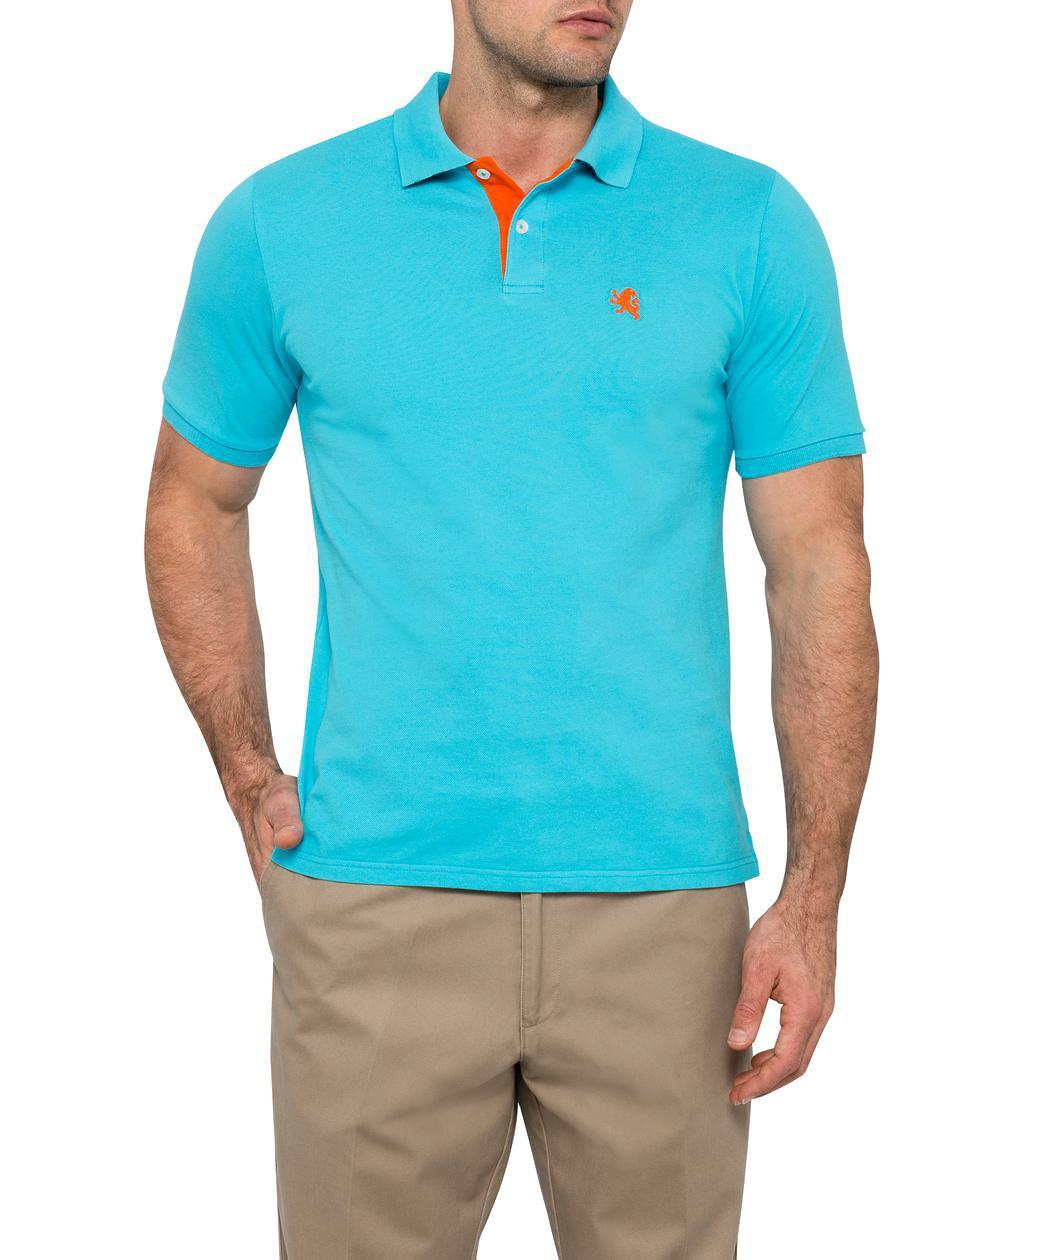 5f1184b8 ... Van Heusen Mens Casual Sports Polo Shirt. Product Image. Image 1 Image 2